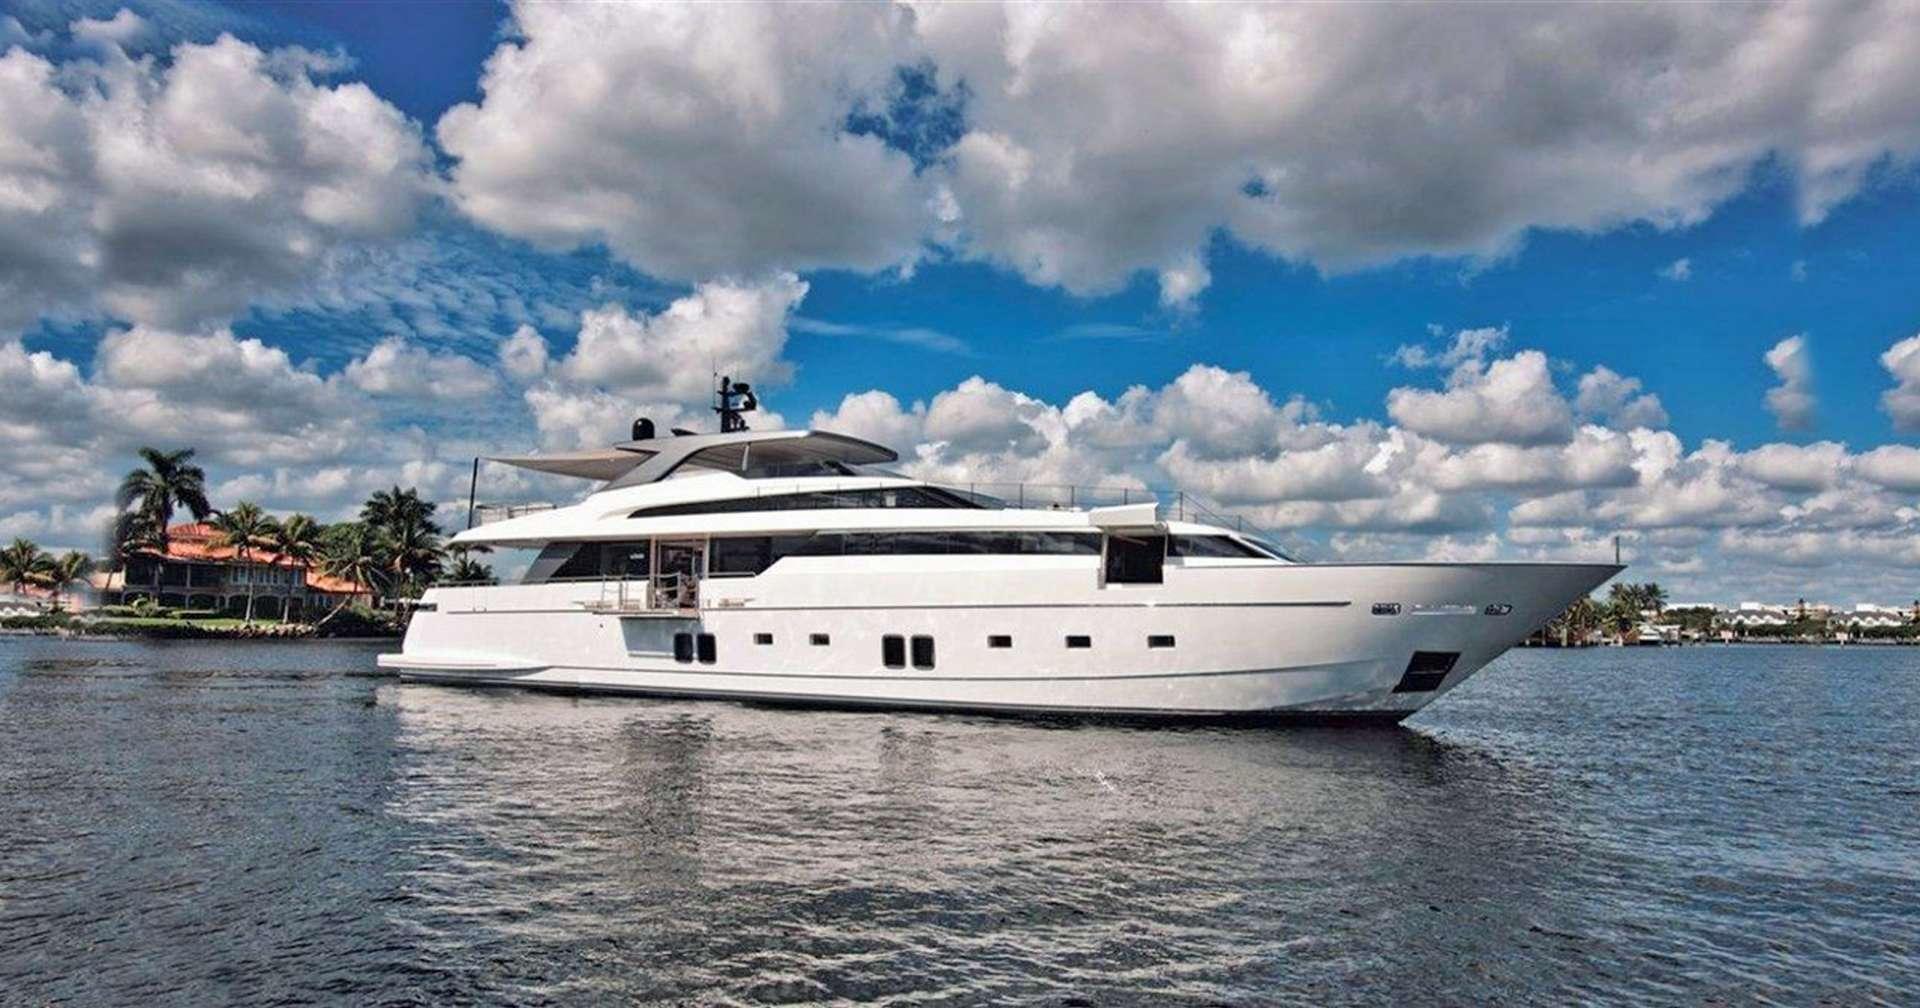 Main image of MORNING STAR yacht